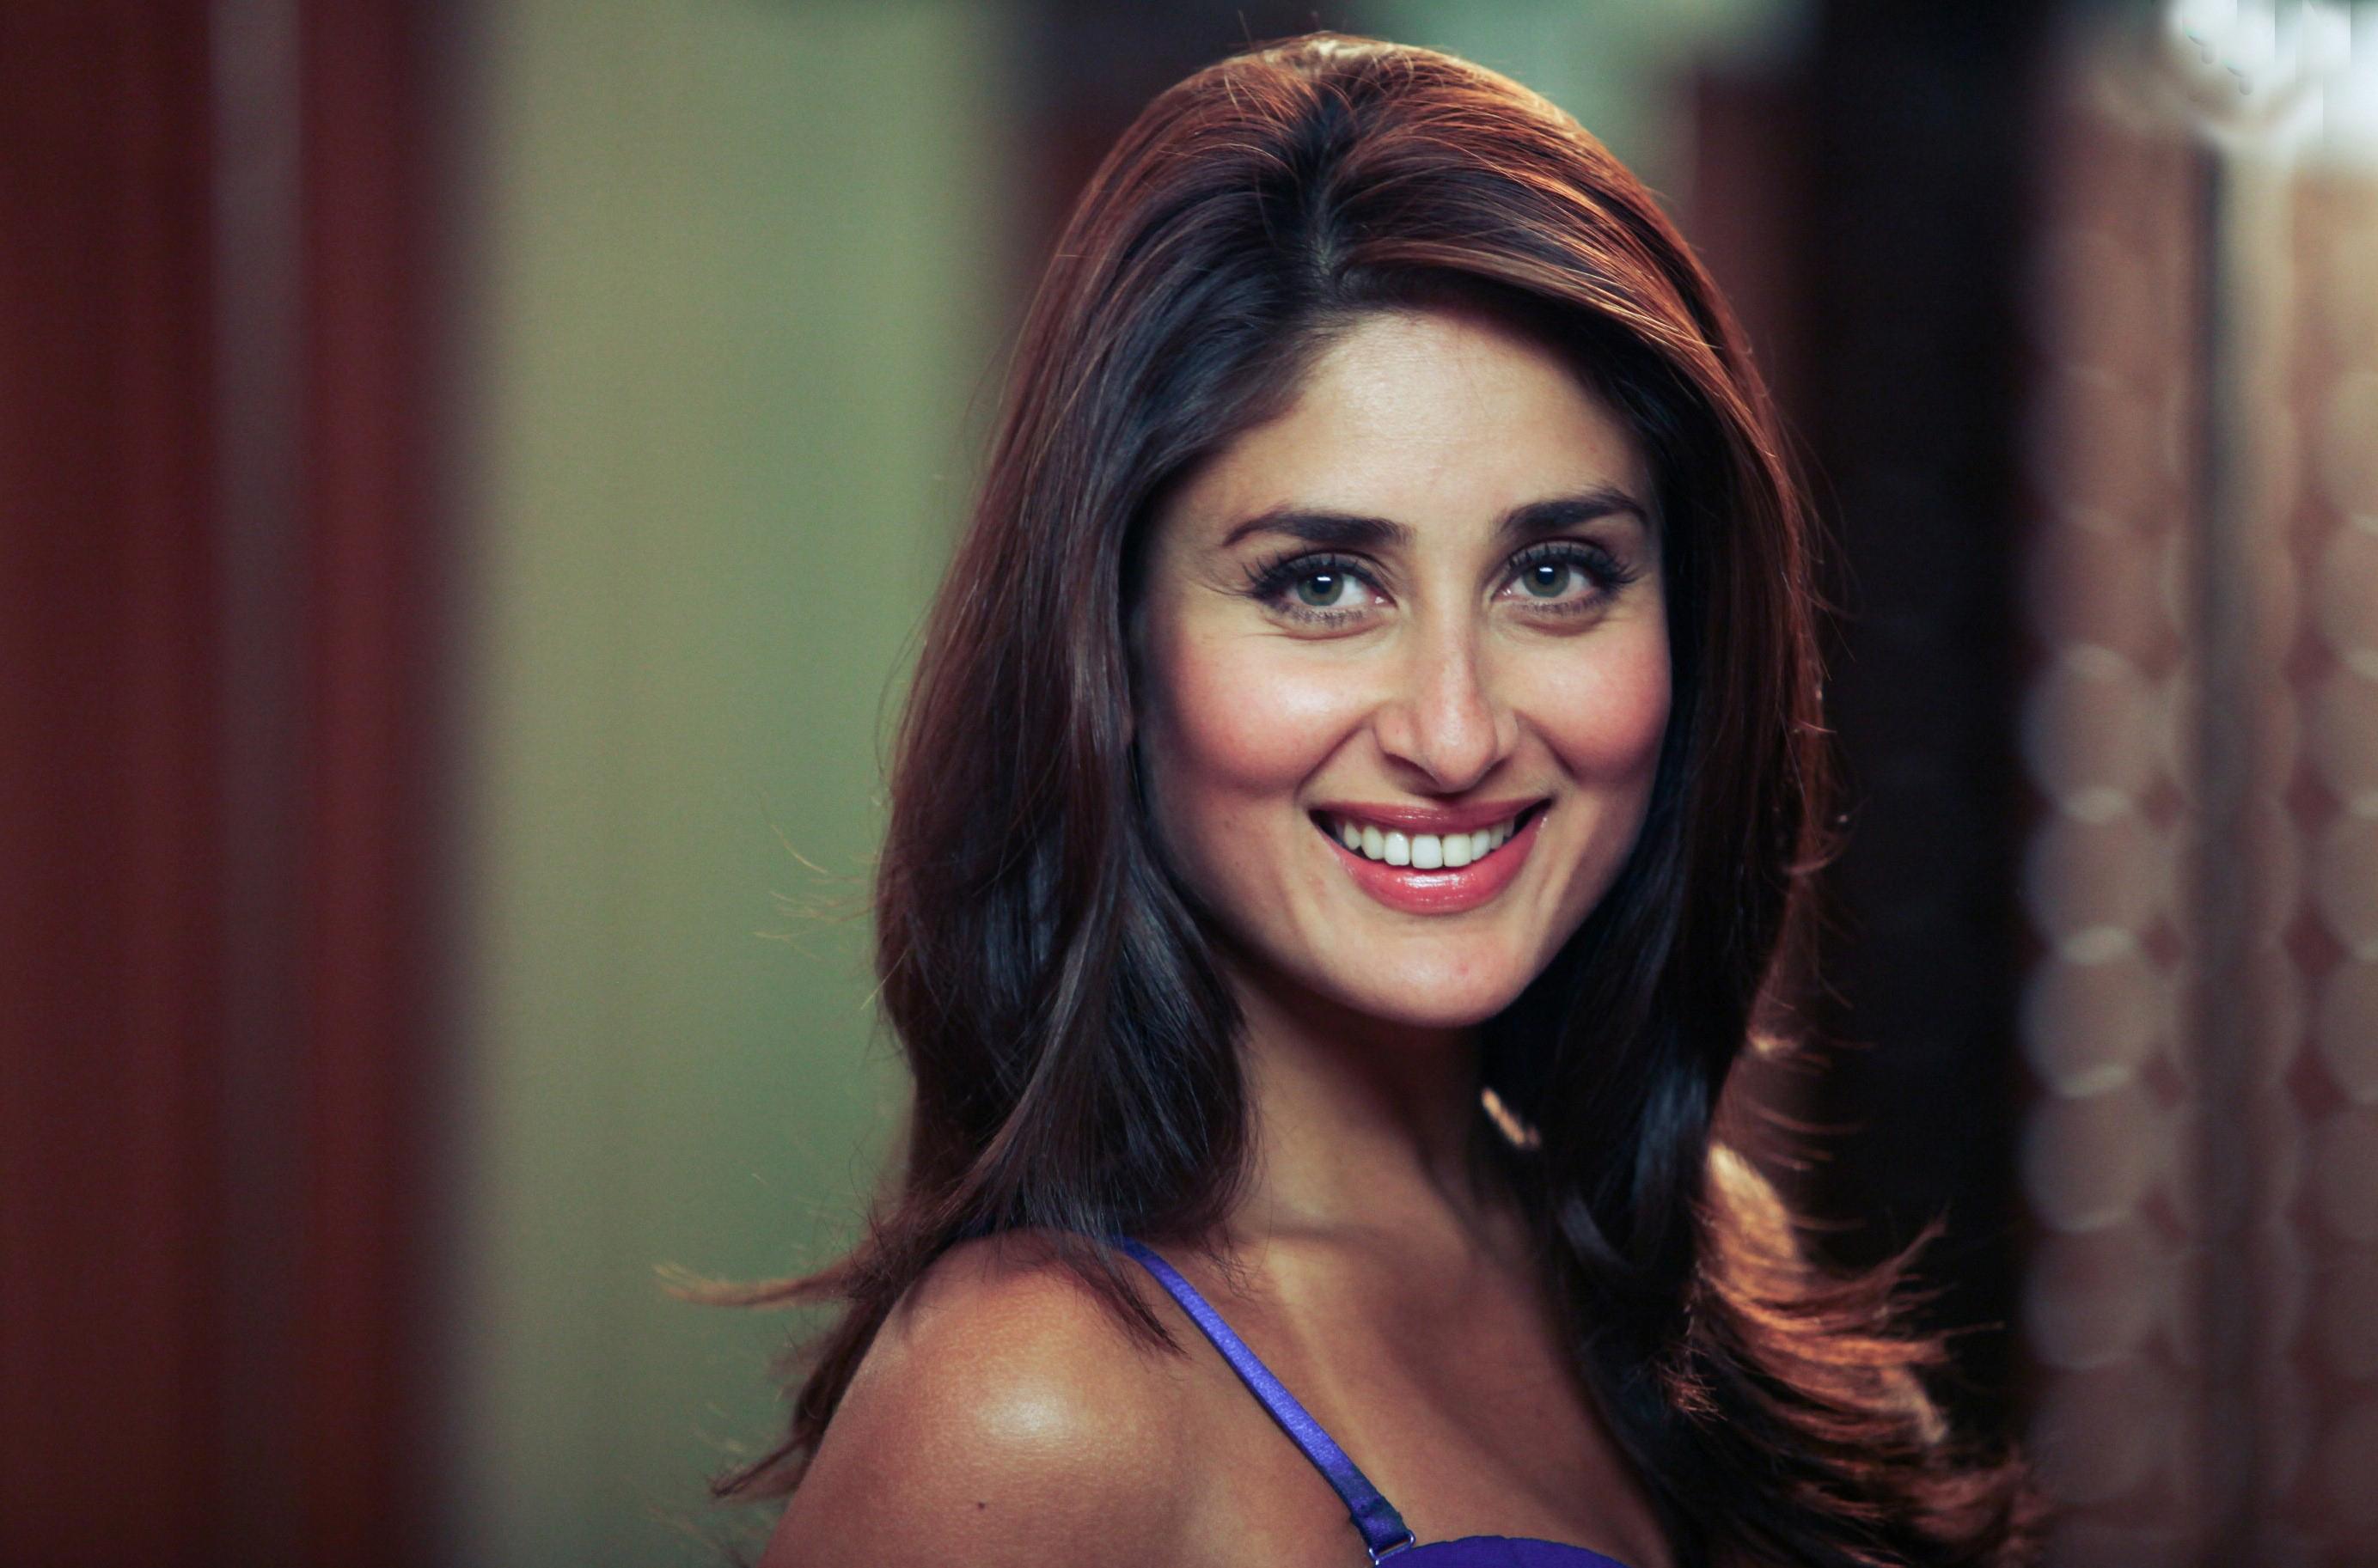 kareena kapoor closeup smile photoshoot, full hd 2k wallpaper